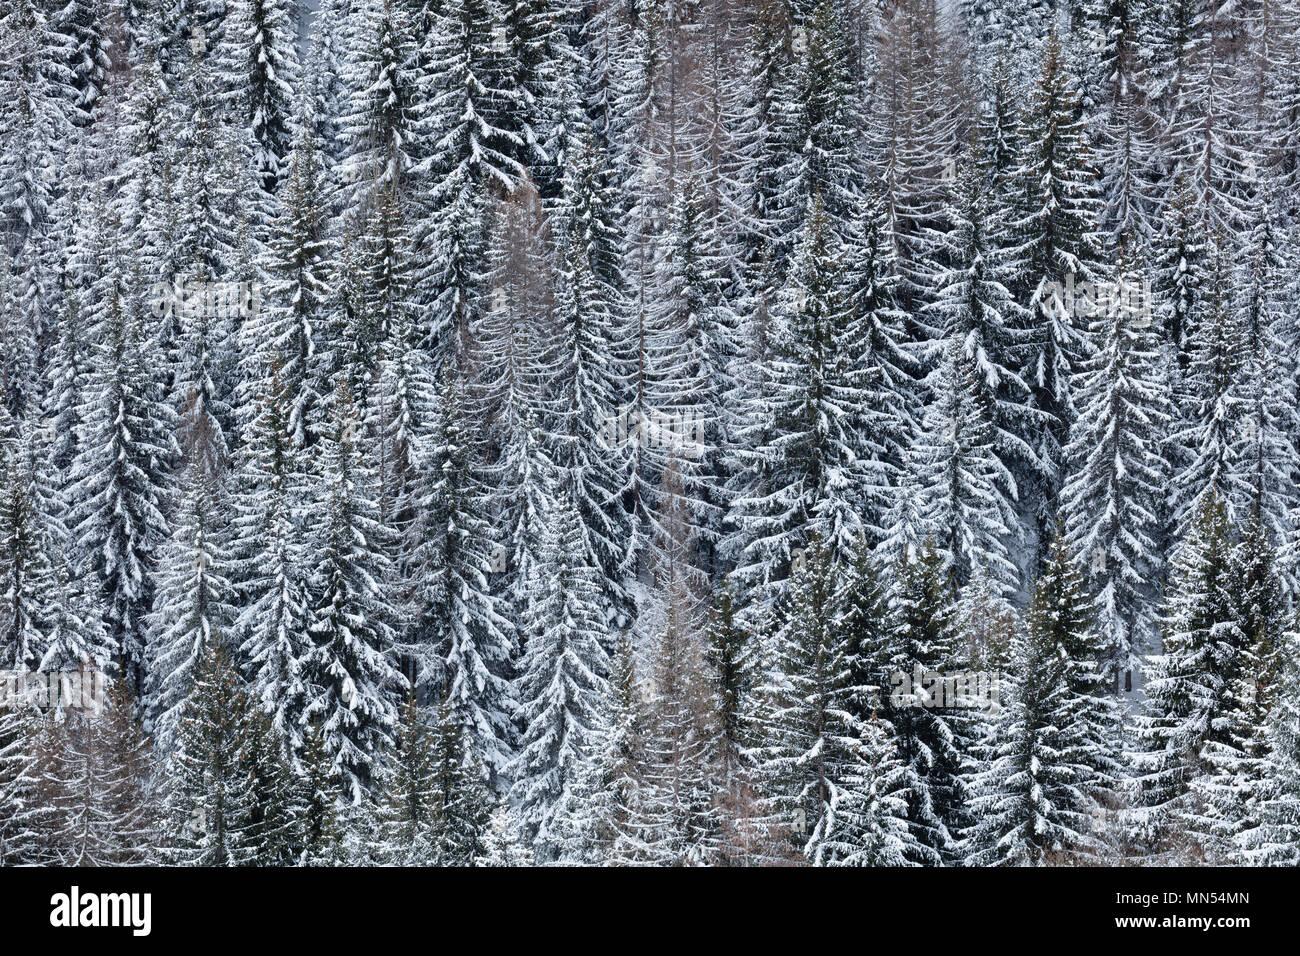 Snow on trees, La Tzoumaz, Valais, Switzerland, - Stock Image